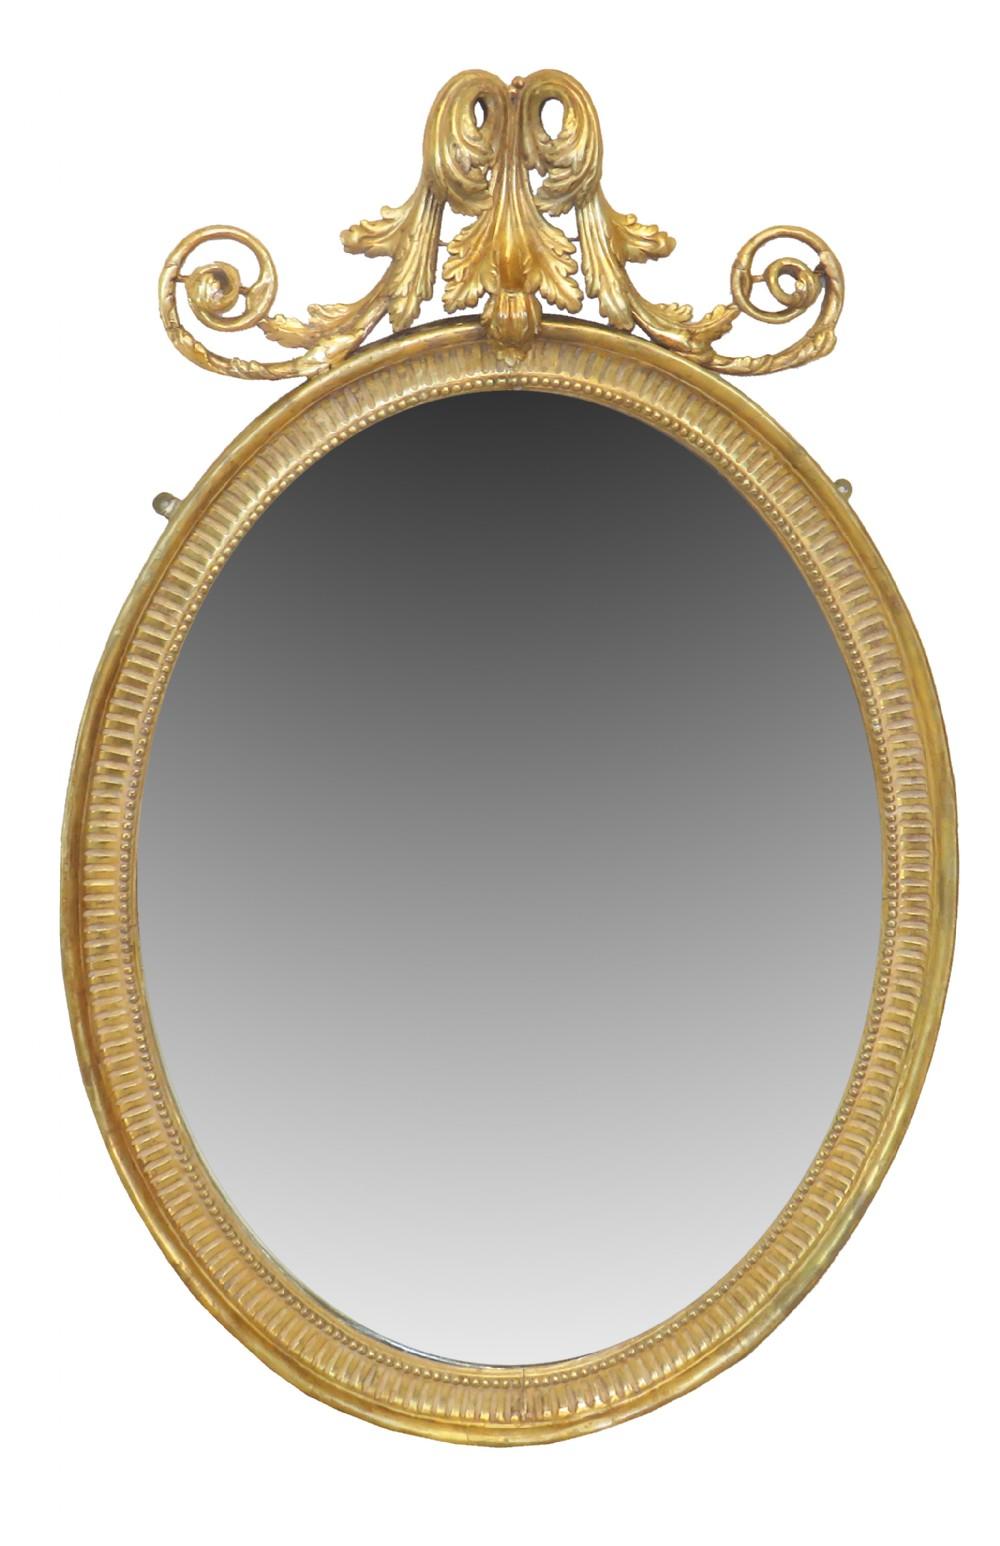 18th century english oval gilt pier mirror